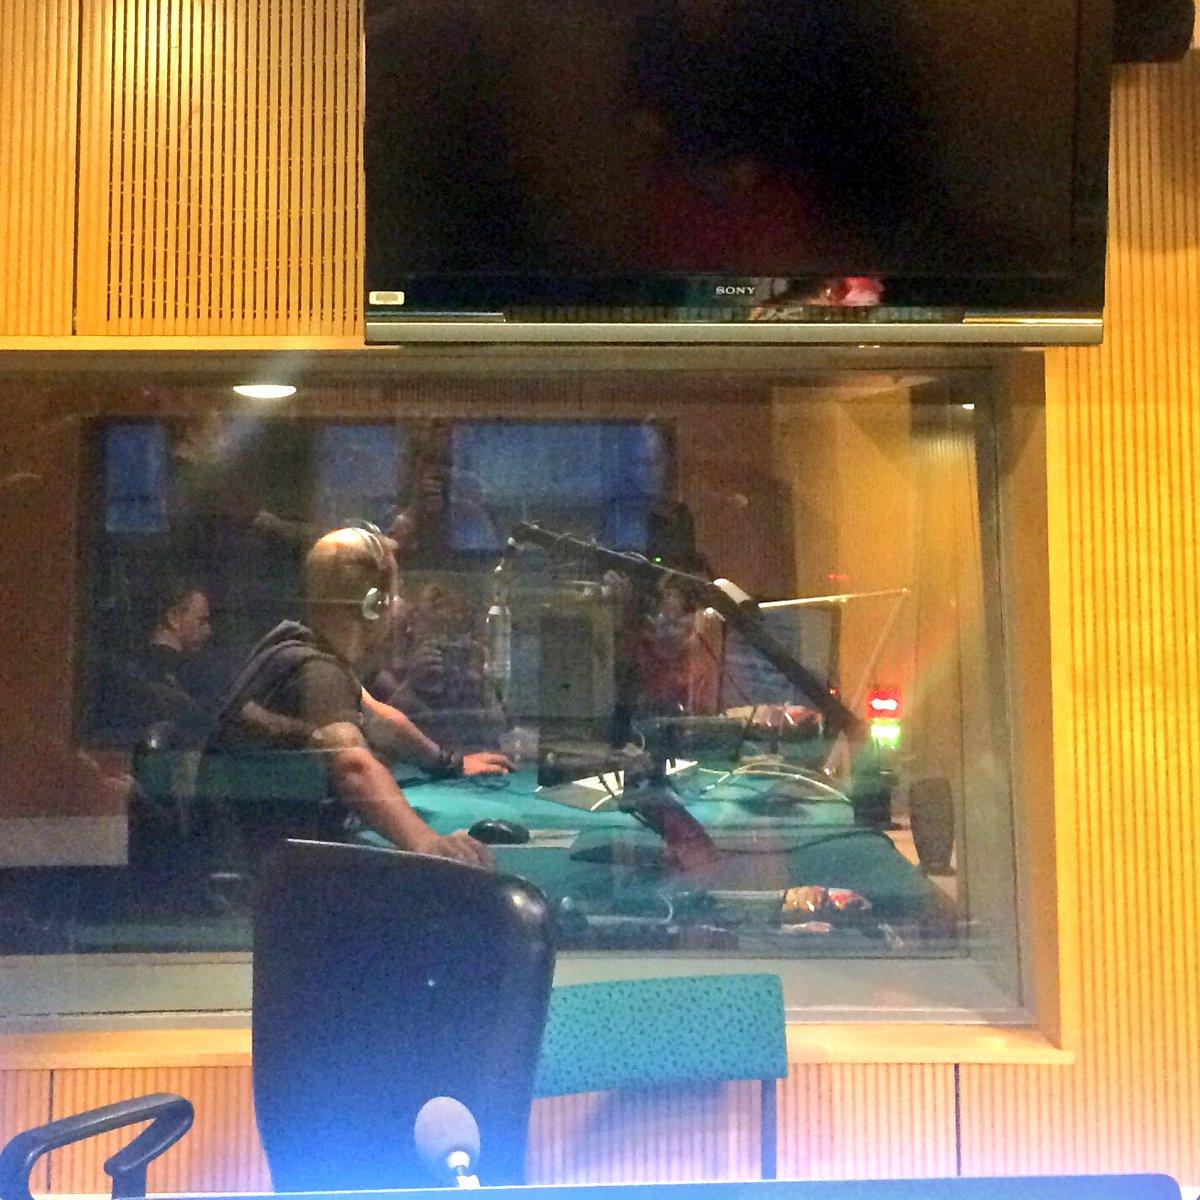 #radiobattleSI @andrejkaroli in action \m/ @Val202 https://t.co/KGDFKZWLk0